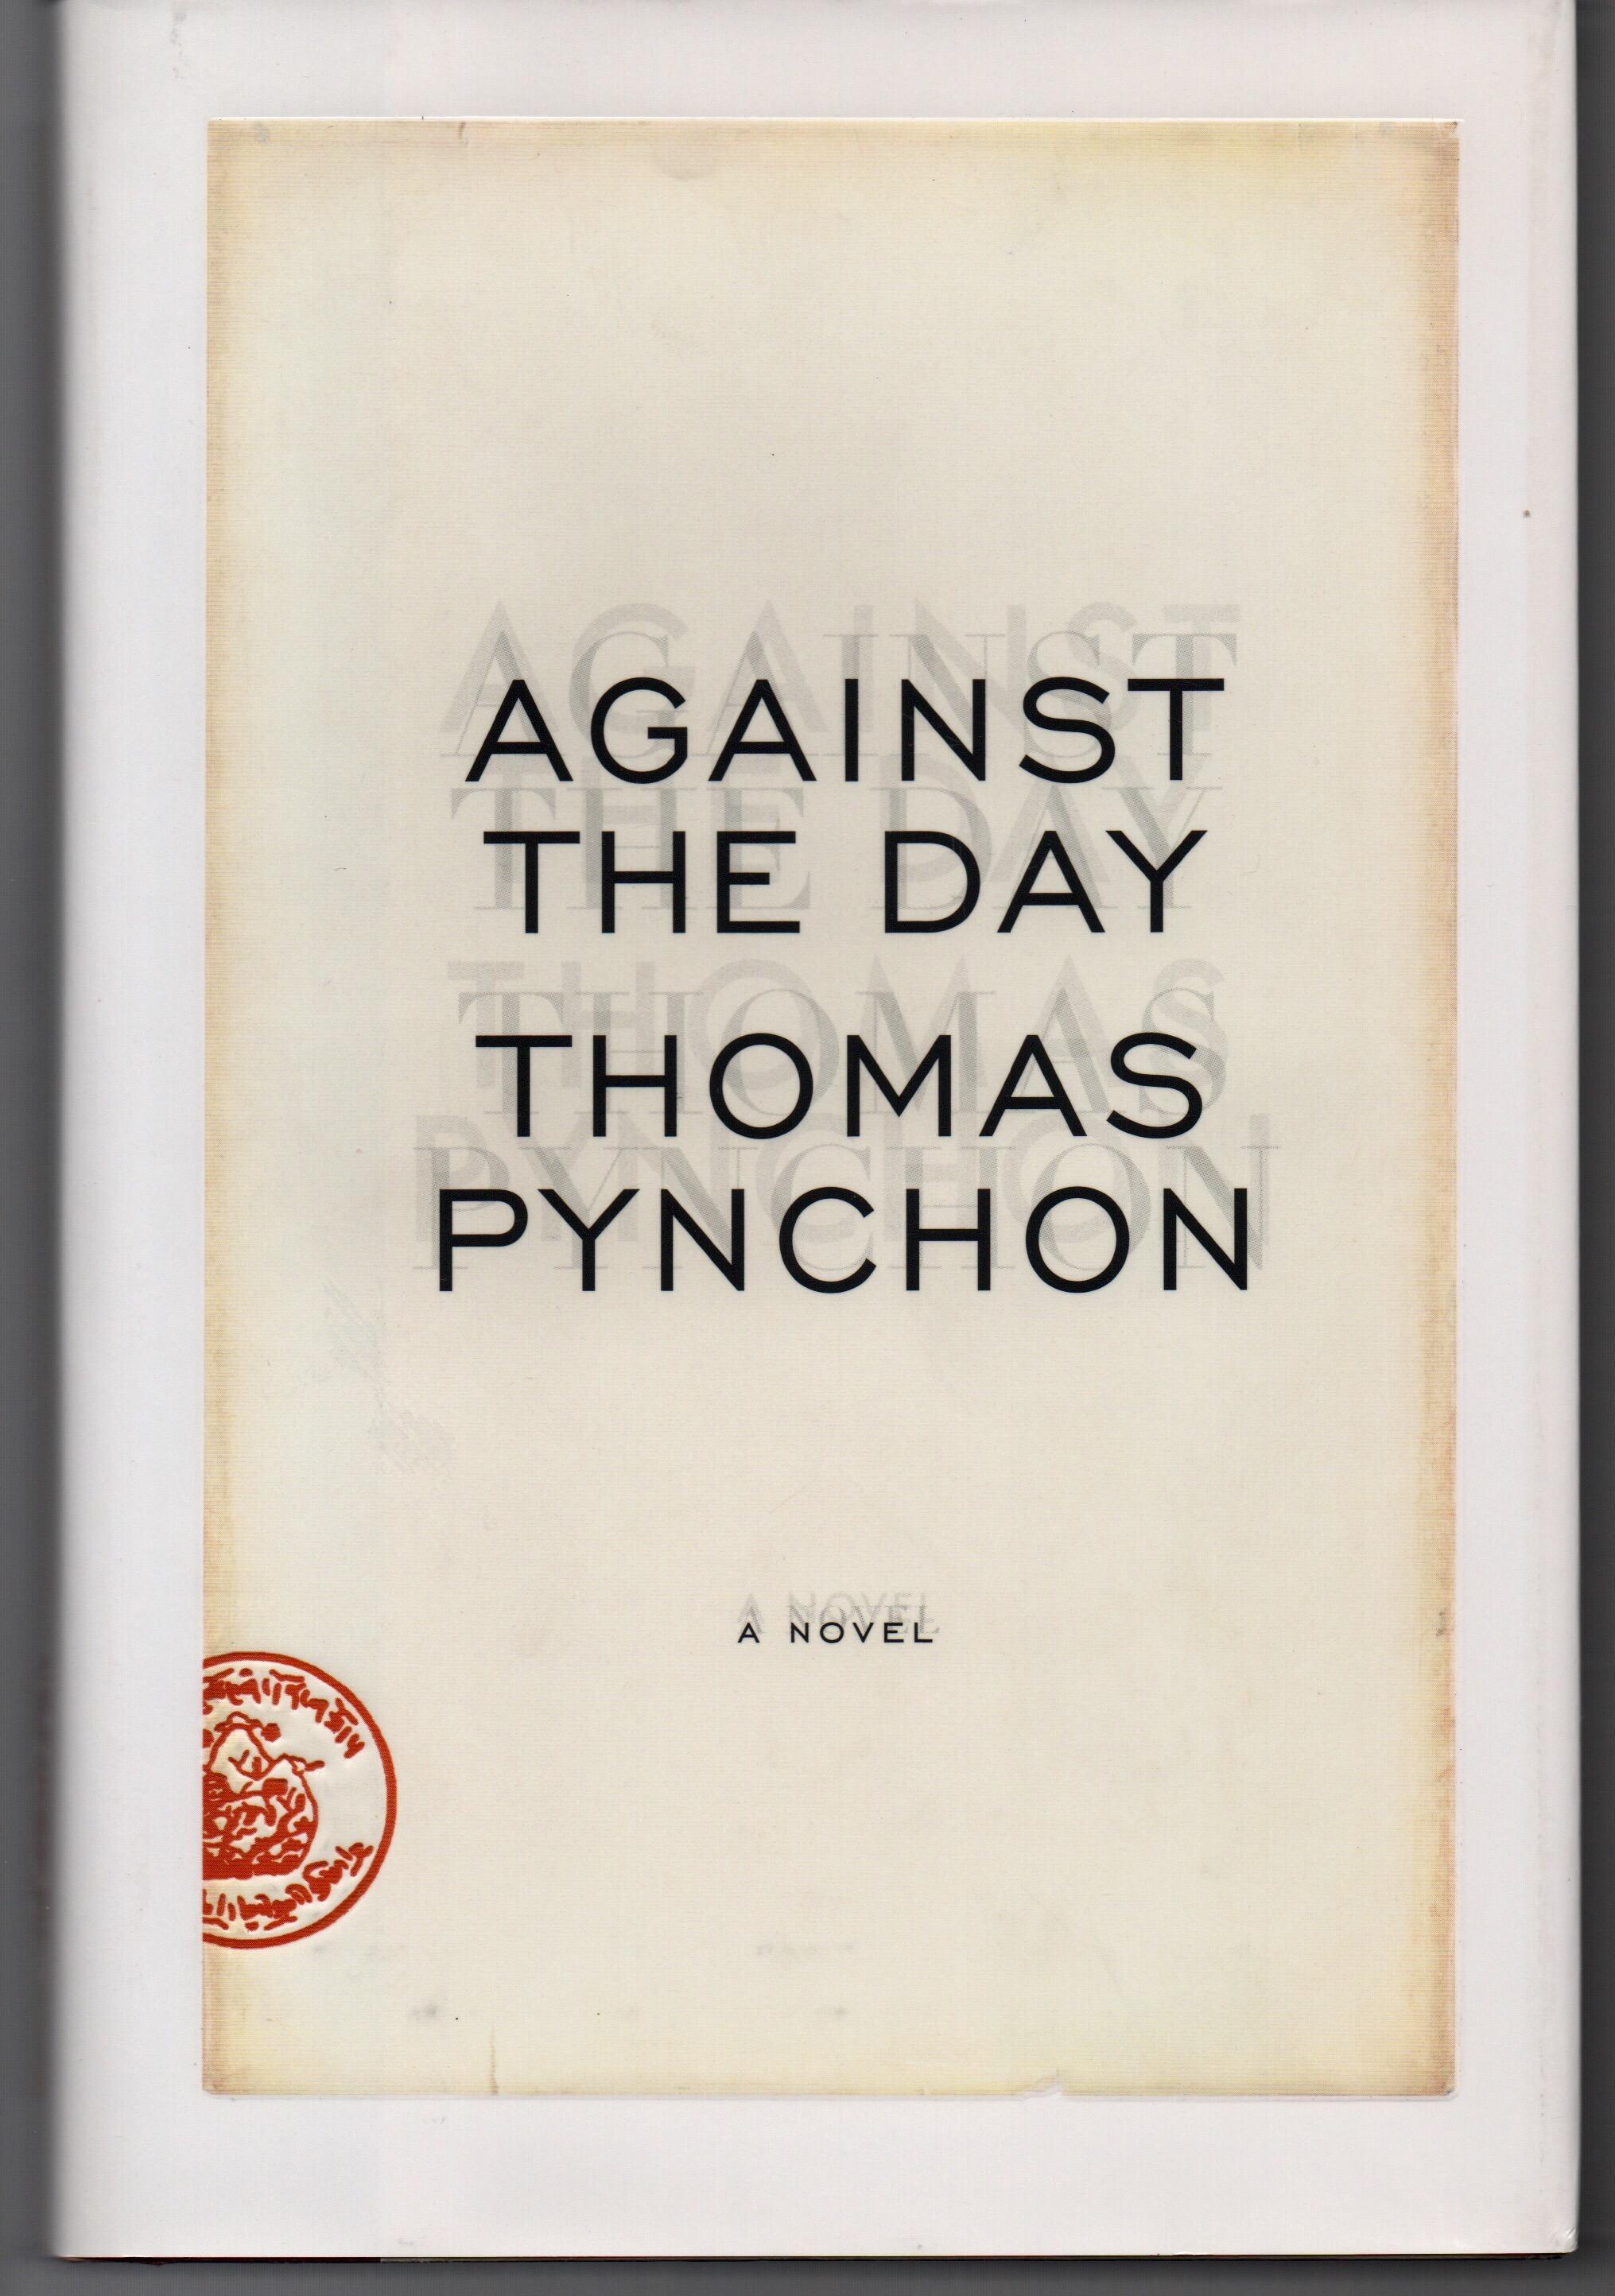 pynchon sloth essay